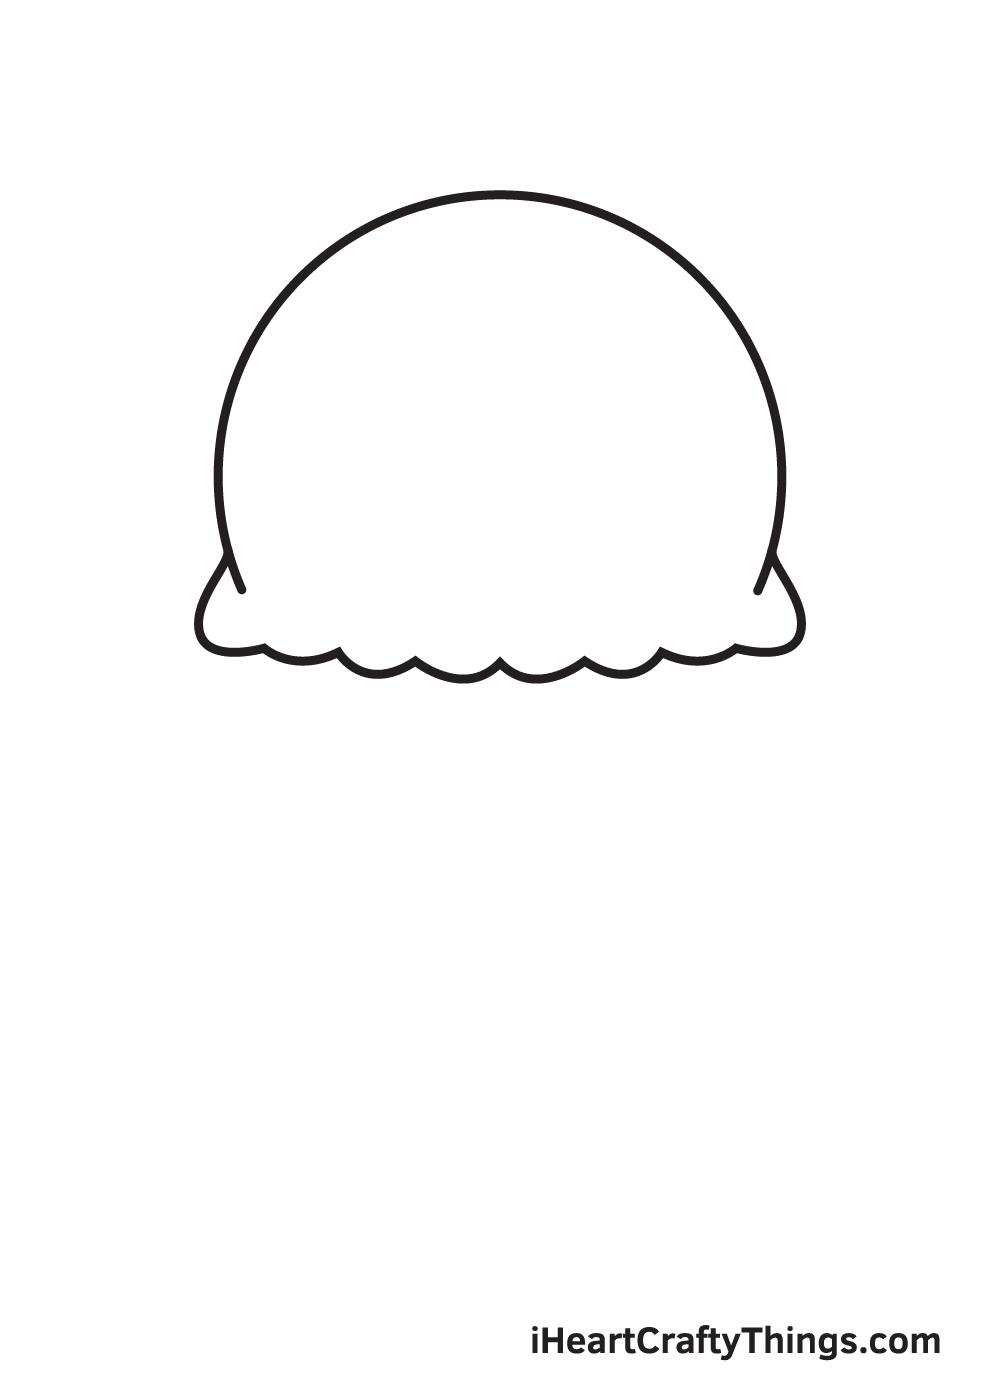 jellyfish drawing step 2